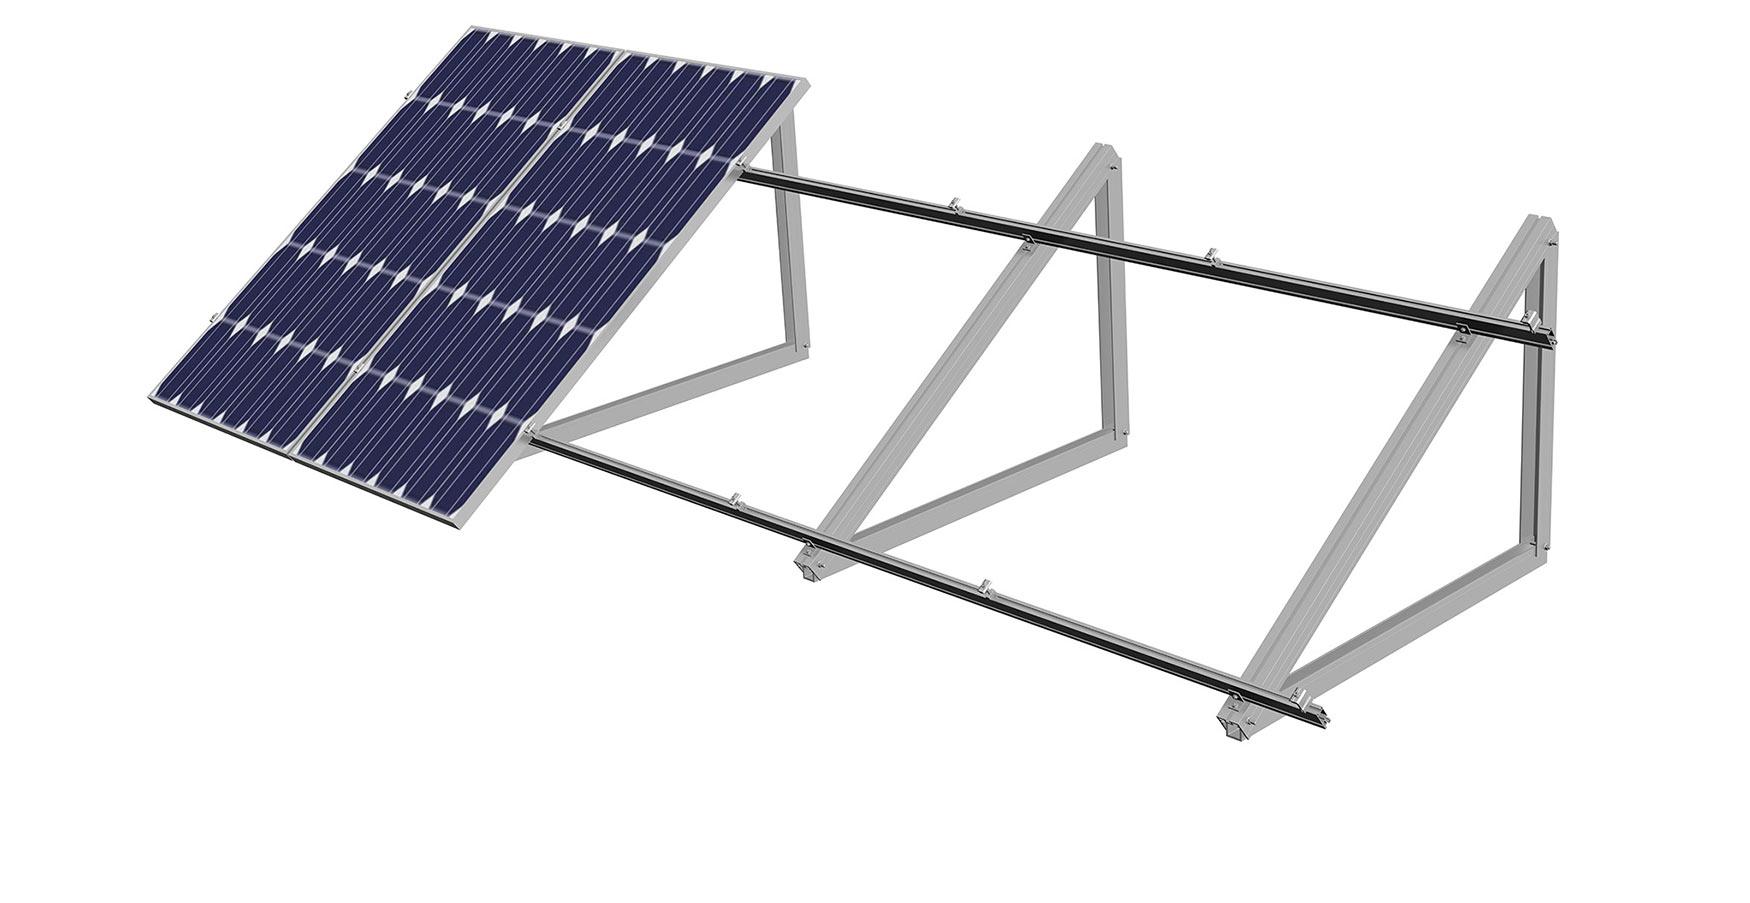 1750x903 Sunshield Awning Solar Mounting Racking Systems Sunmodo